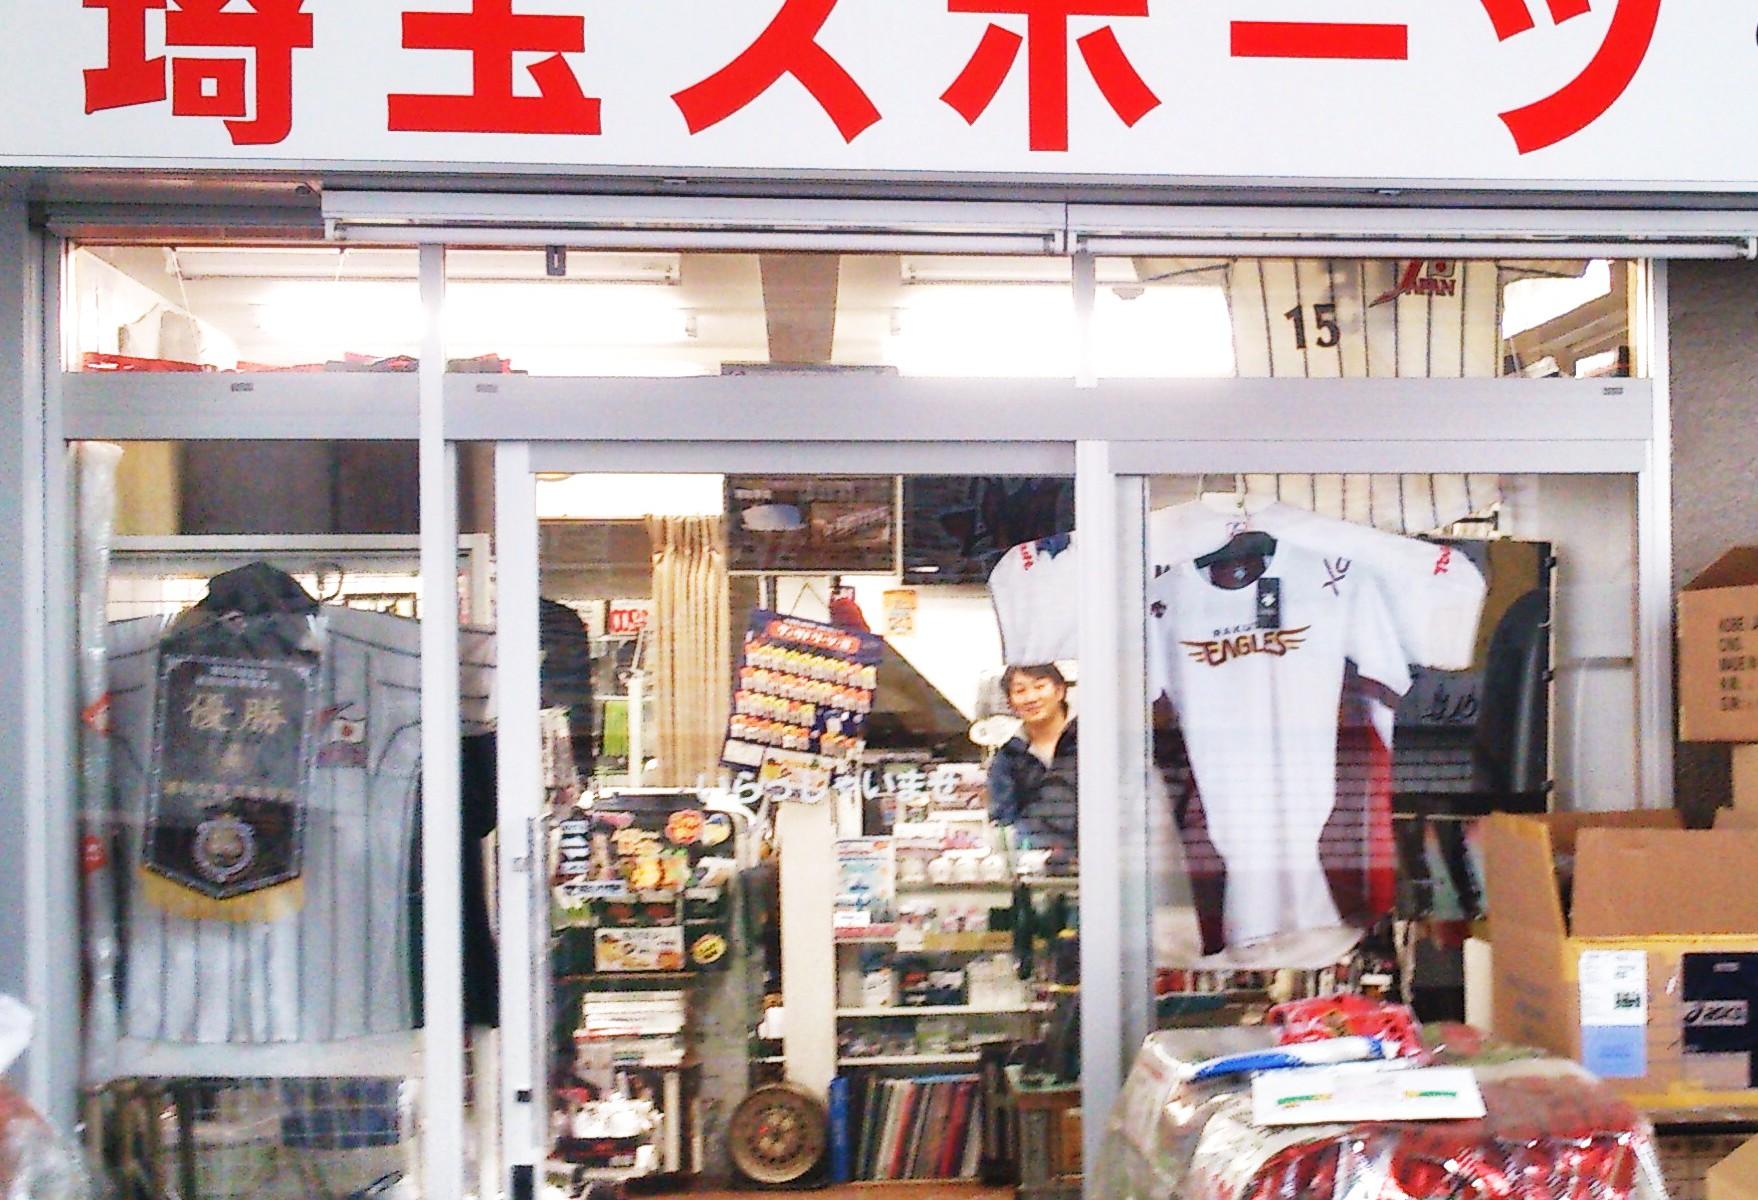 http://g-league-locker.sakura.ne.jp/shops/wp-content/uploads/2014/02/%E5%86%99%E7%9C%9F-2014-01-30-11-39-49-1758x1200.jpg